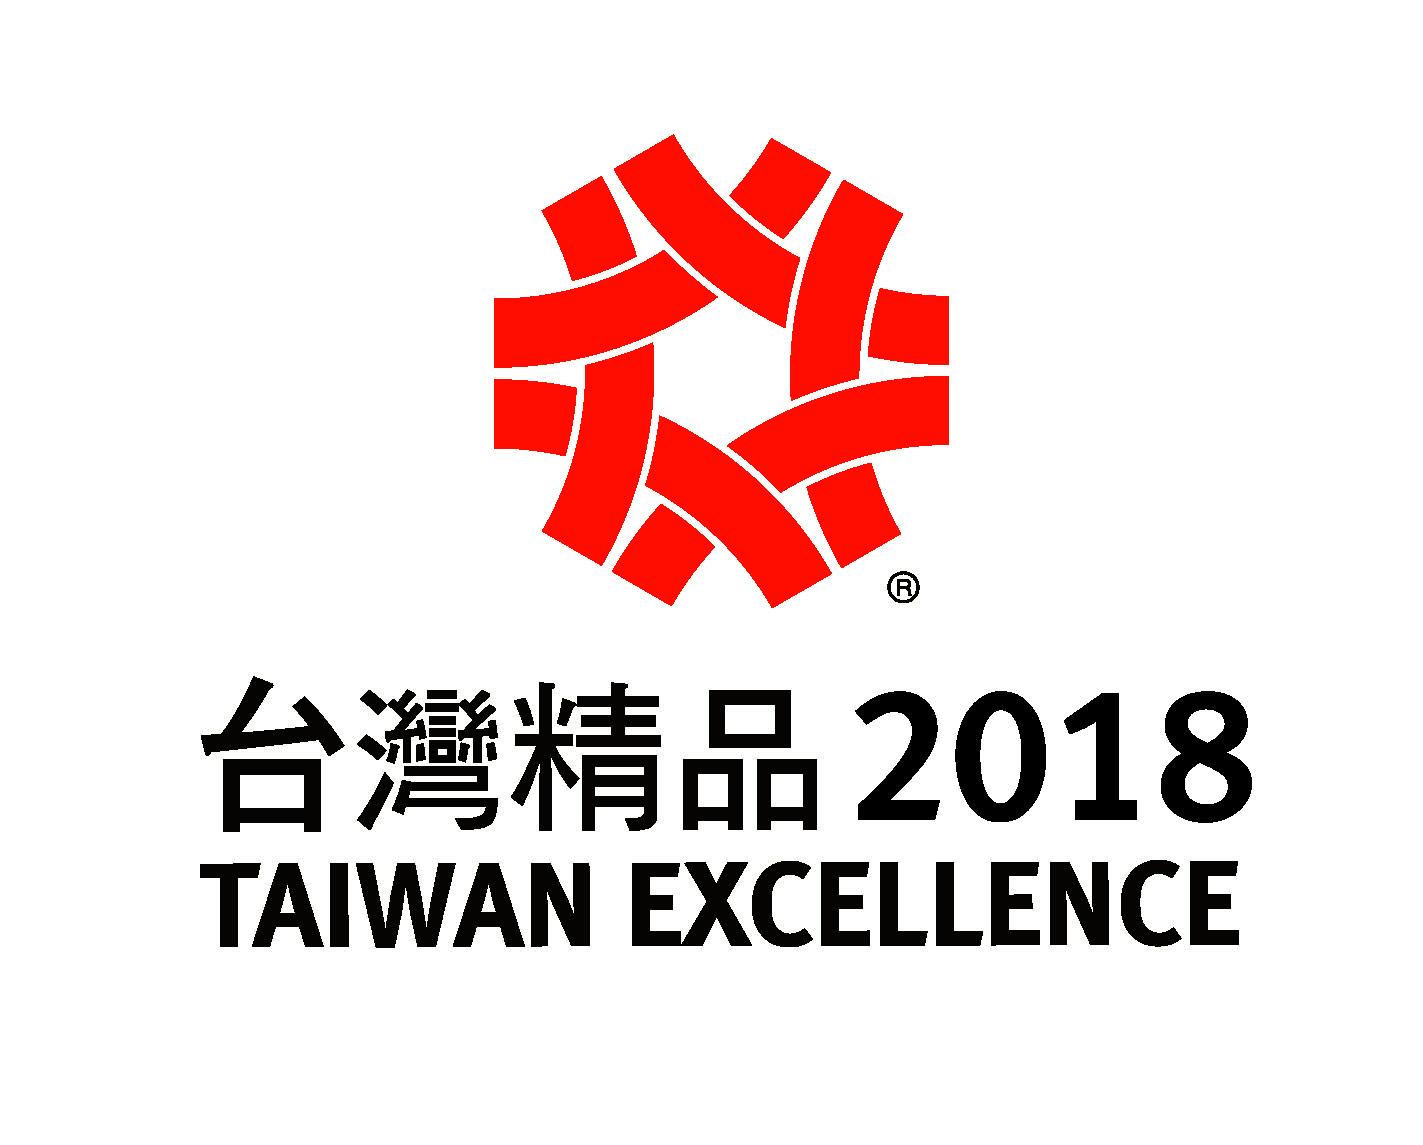 Storejet 25m3 Transcend 1tb 25amp039 Usb 30 Taiwan Excellence 2018